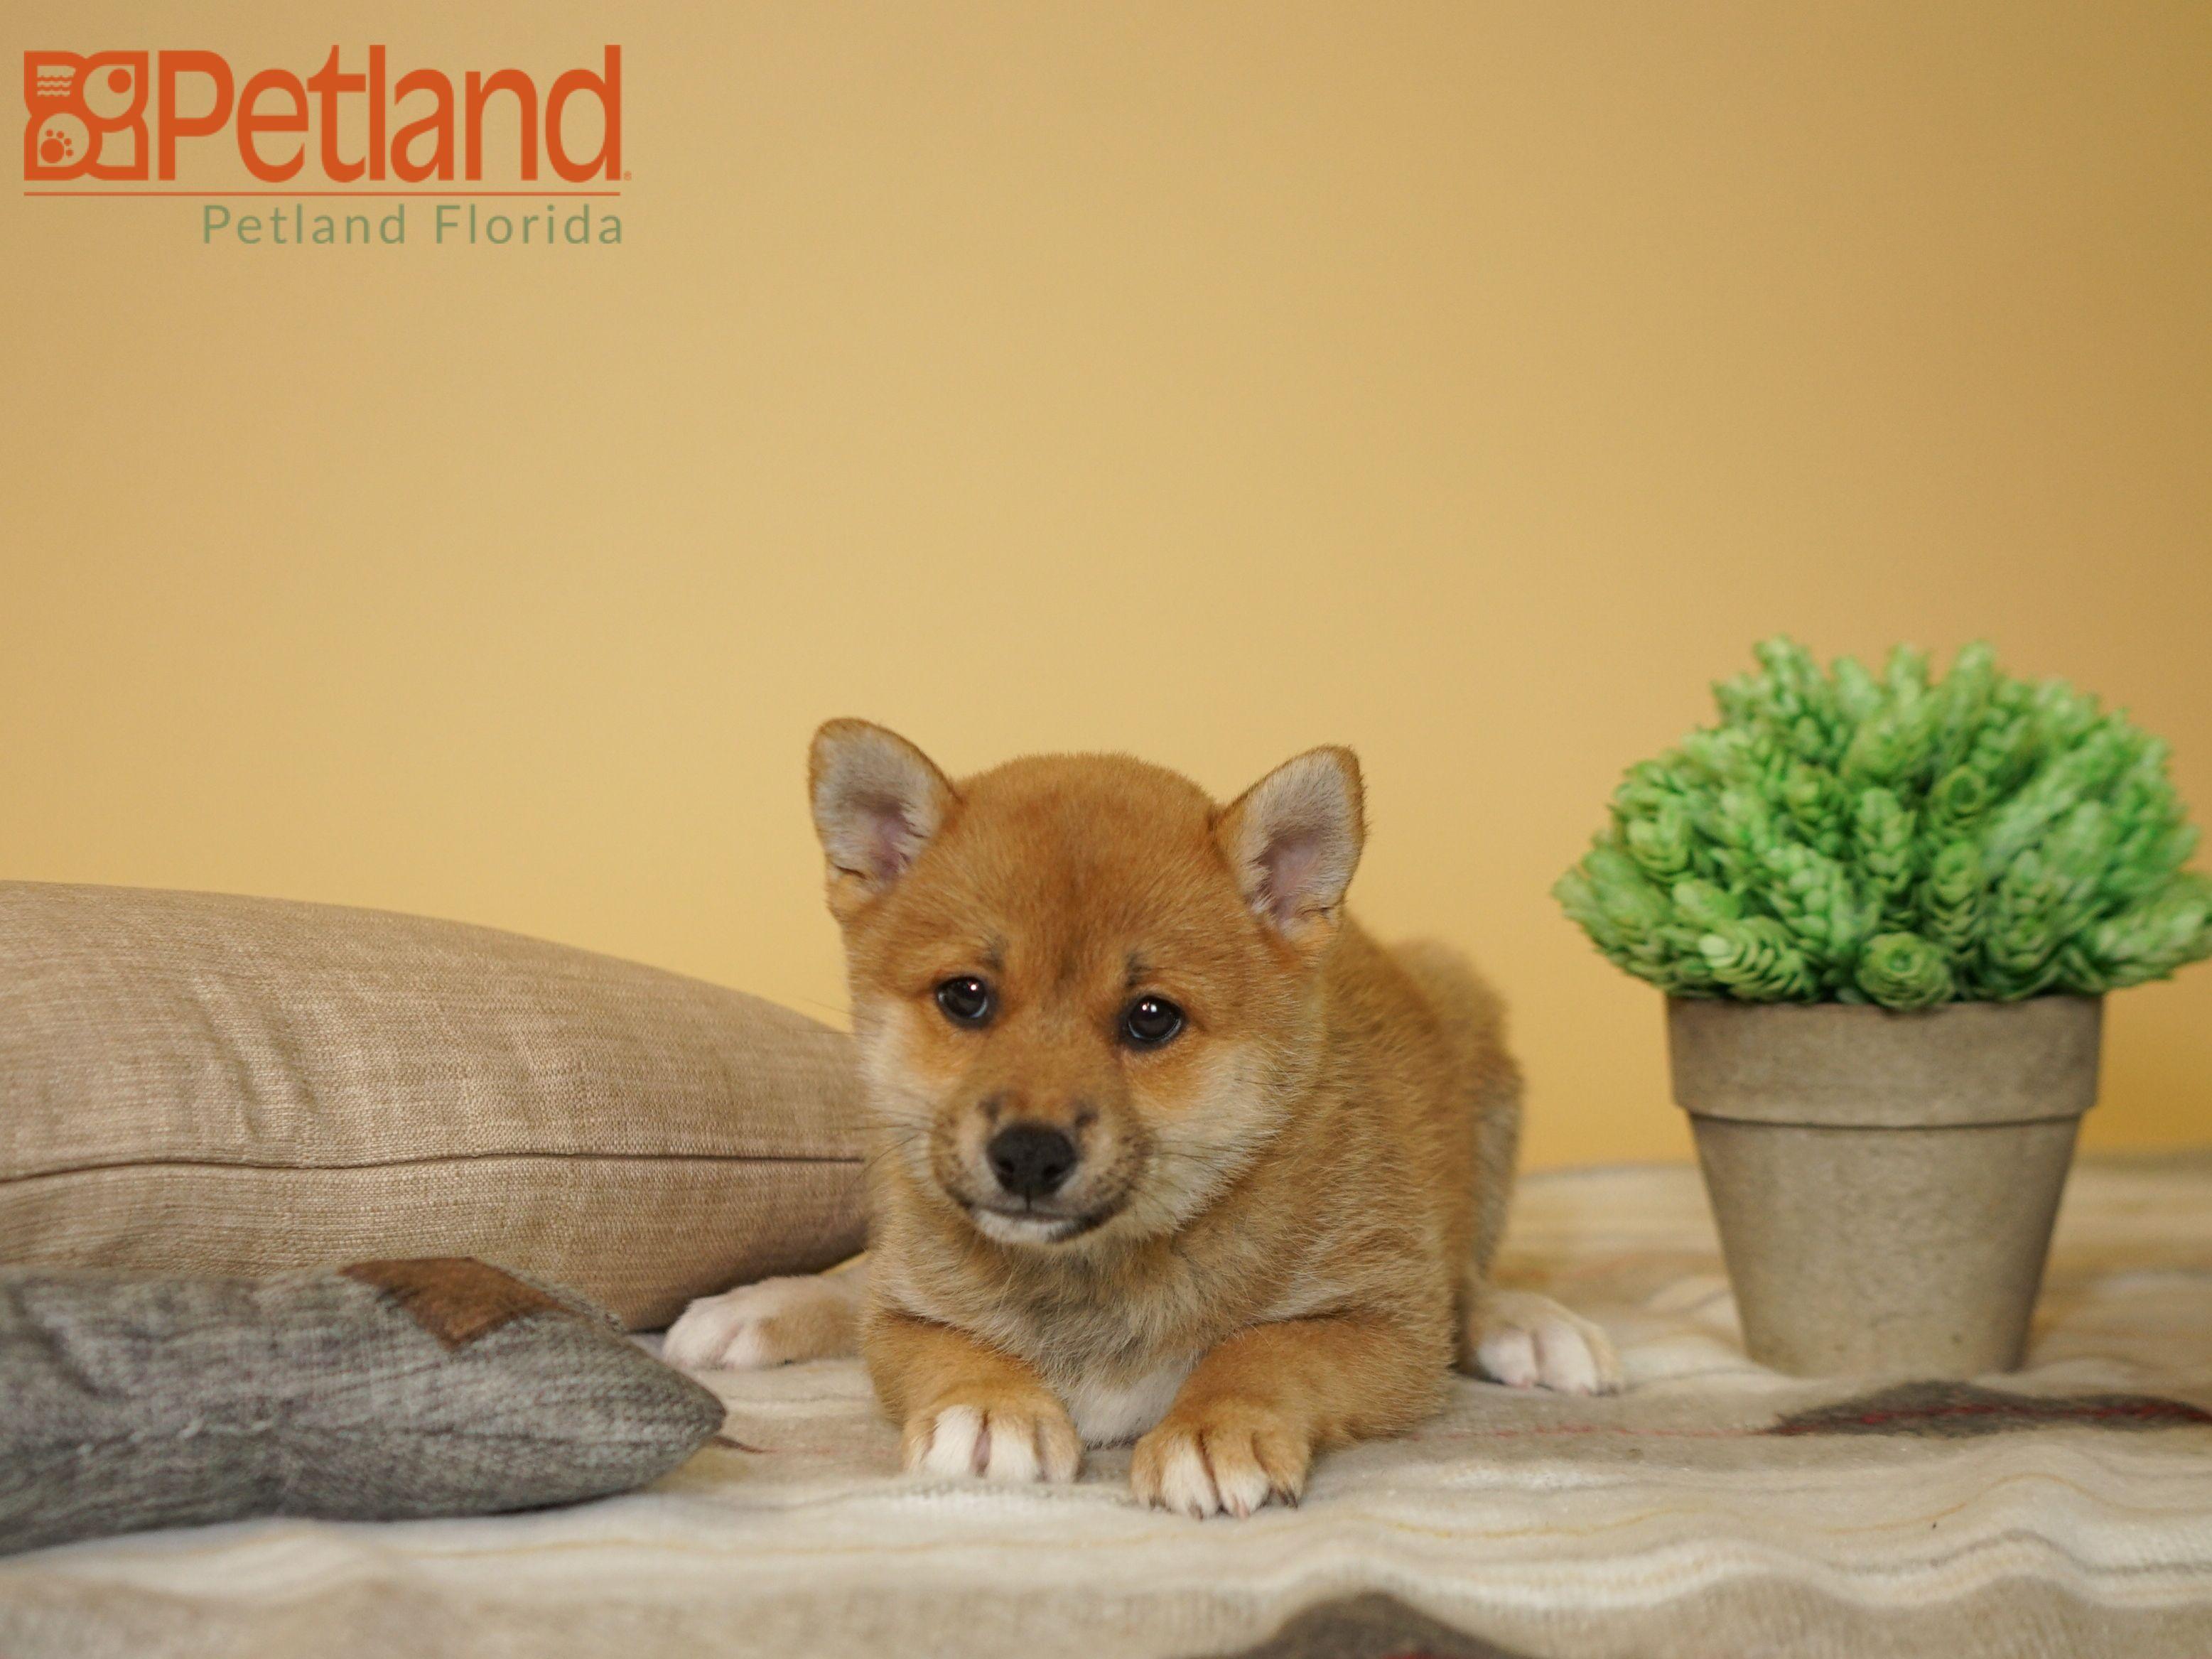 Petland Florida Has Miniature Schnauzer Puppies For Sale Check